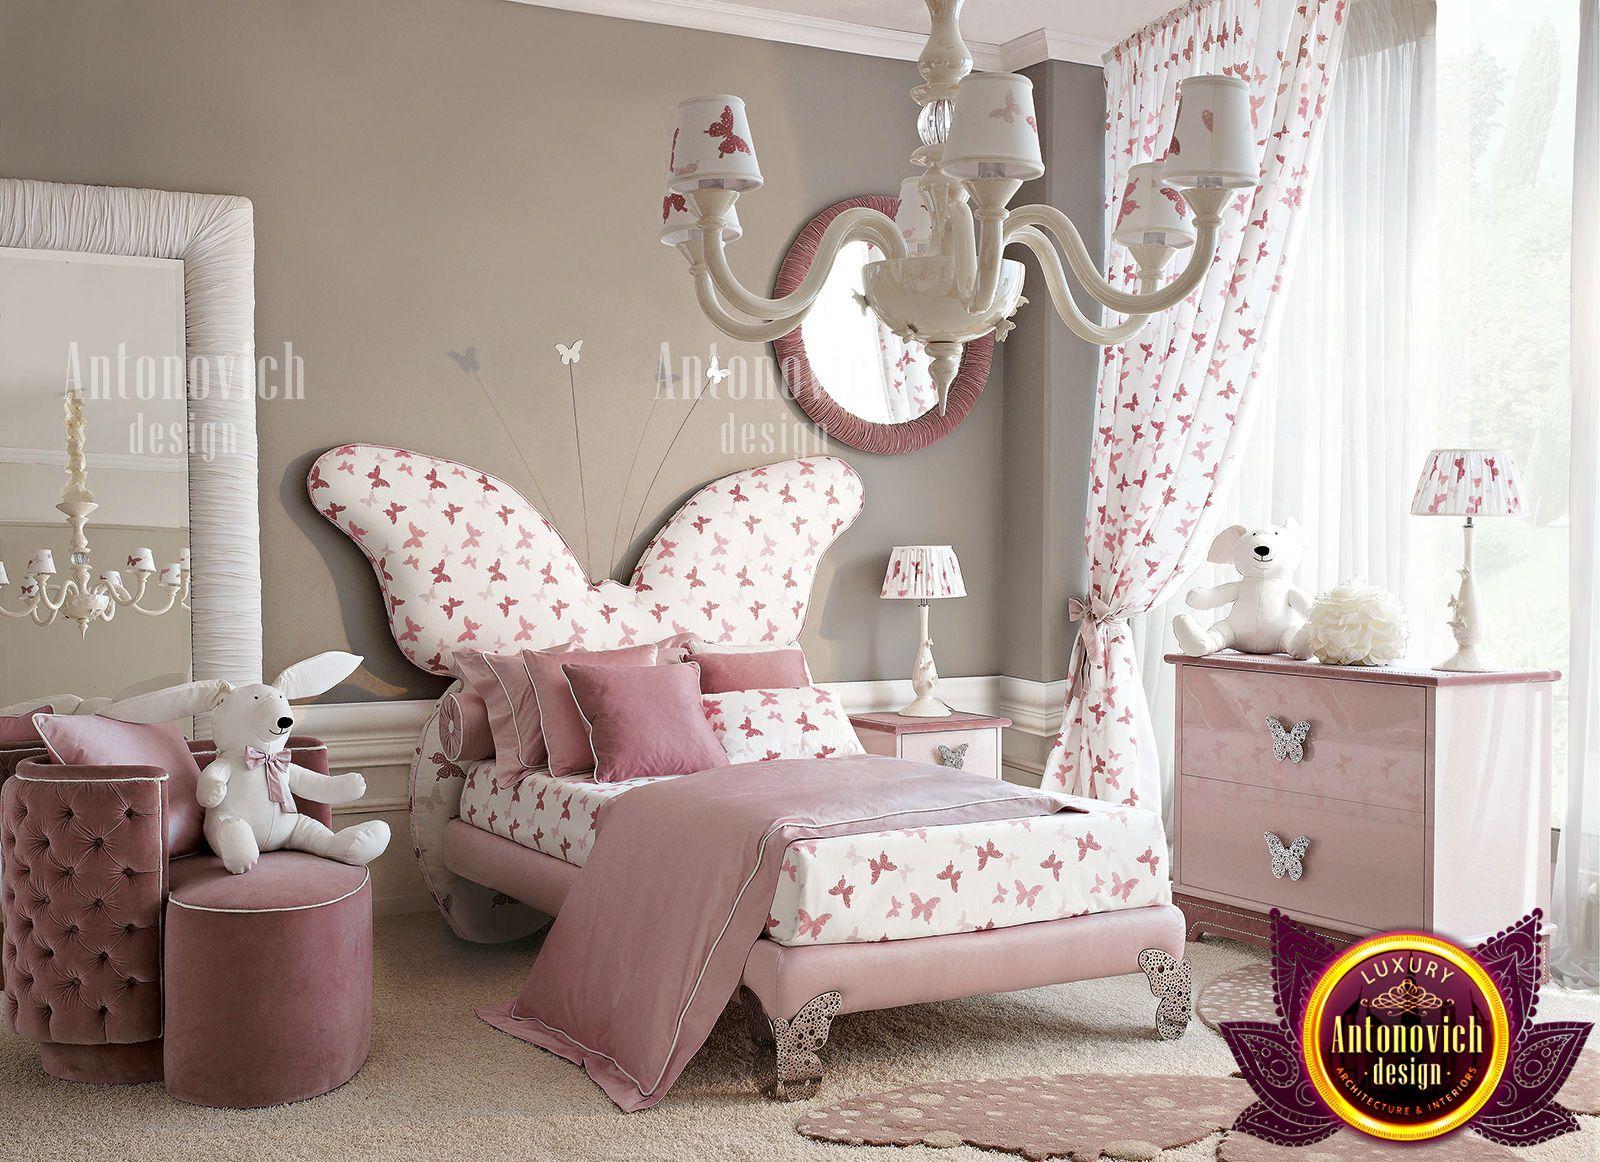 dolfi butterflies decorations romantic butterfly theme.htm designer children s furniture from luxury antonovich design has  furniture from luxury antonovich design